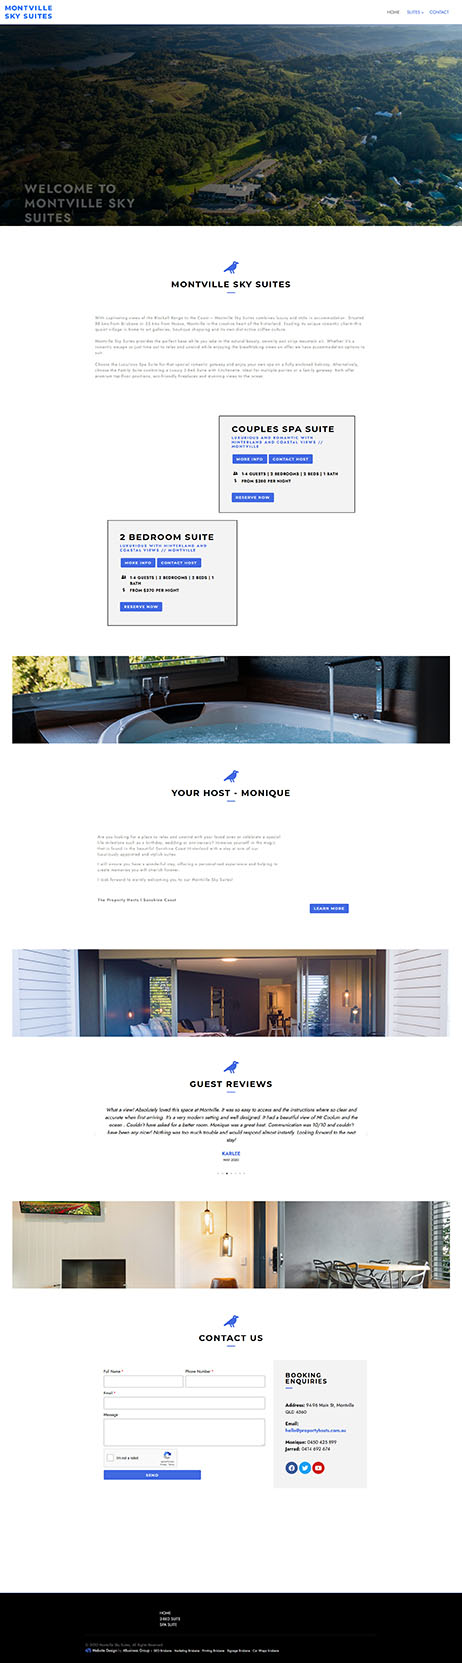 Montville Sky Suites: Desktop View